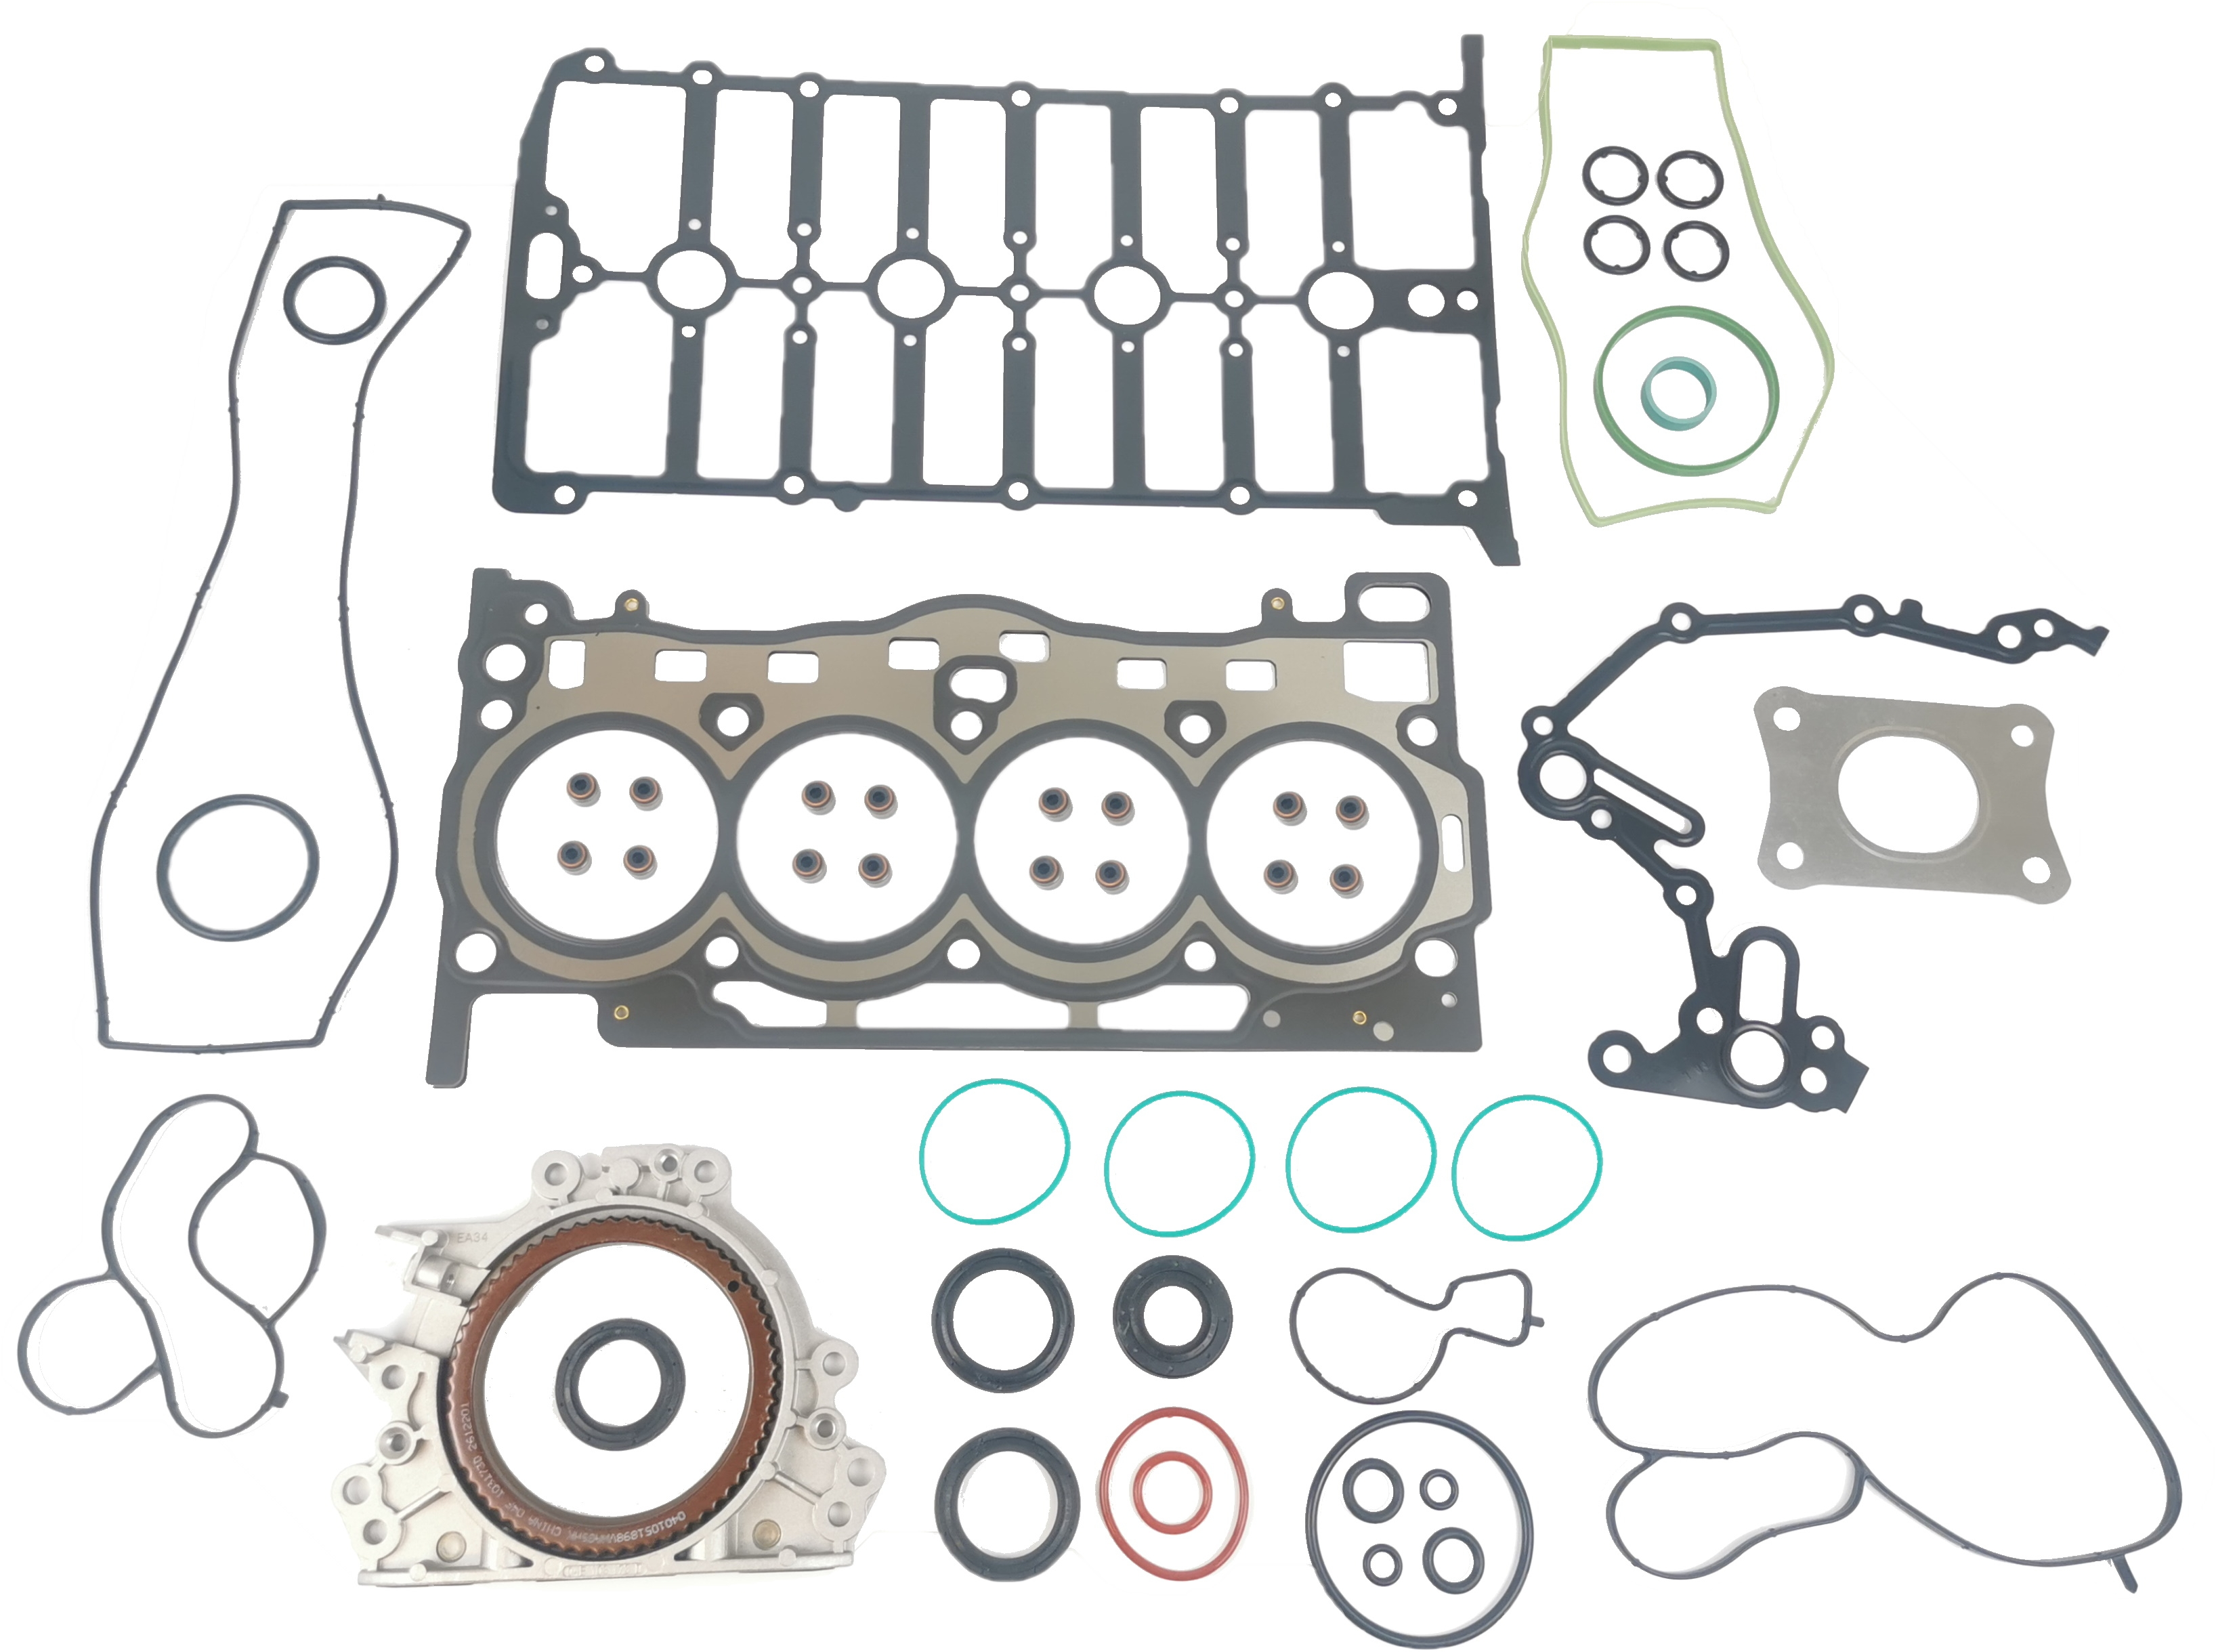 Zylinderkopfdichtung Dichtungssatz für Audi Seat Skoda VW 1,4 TSI TFSI CRJ NEU